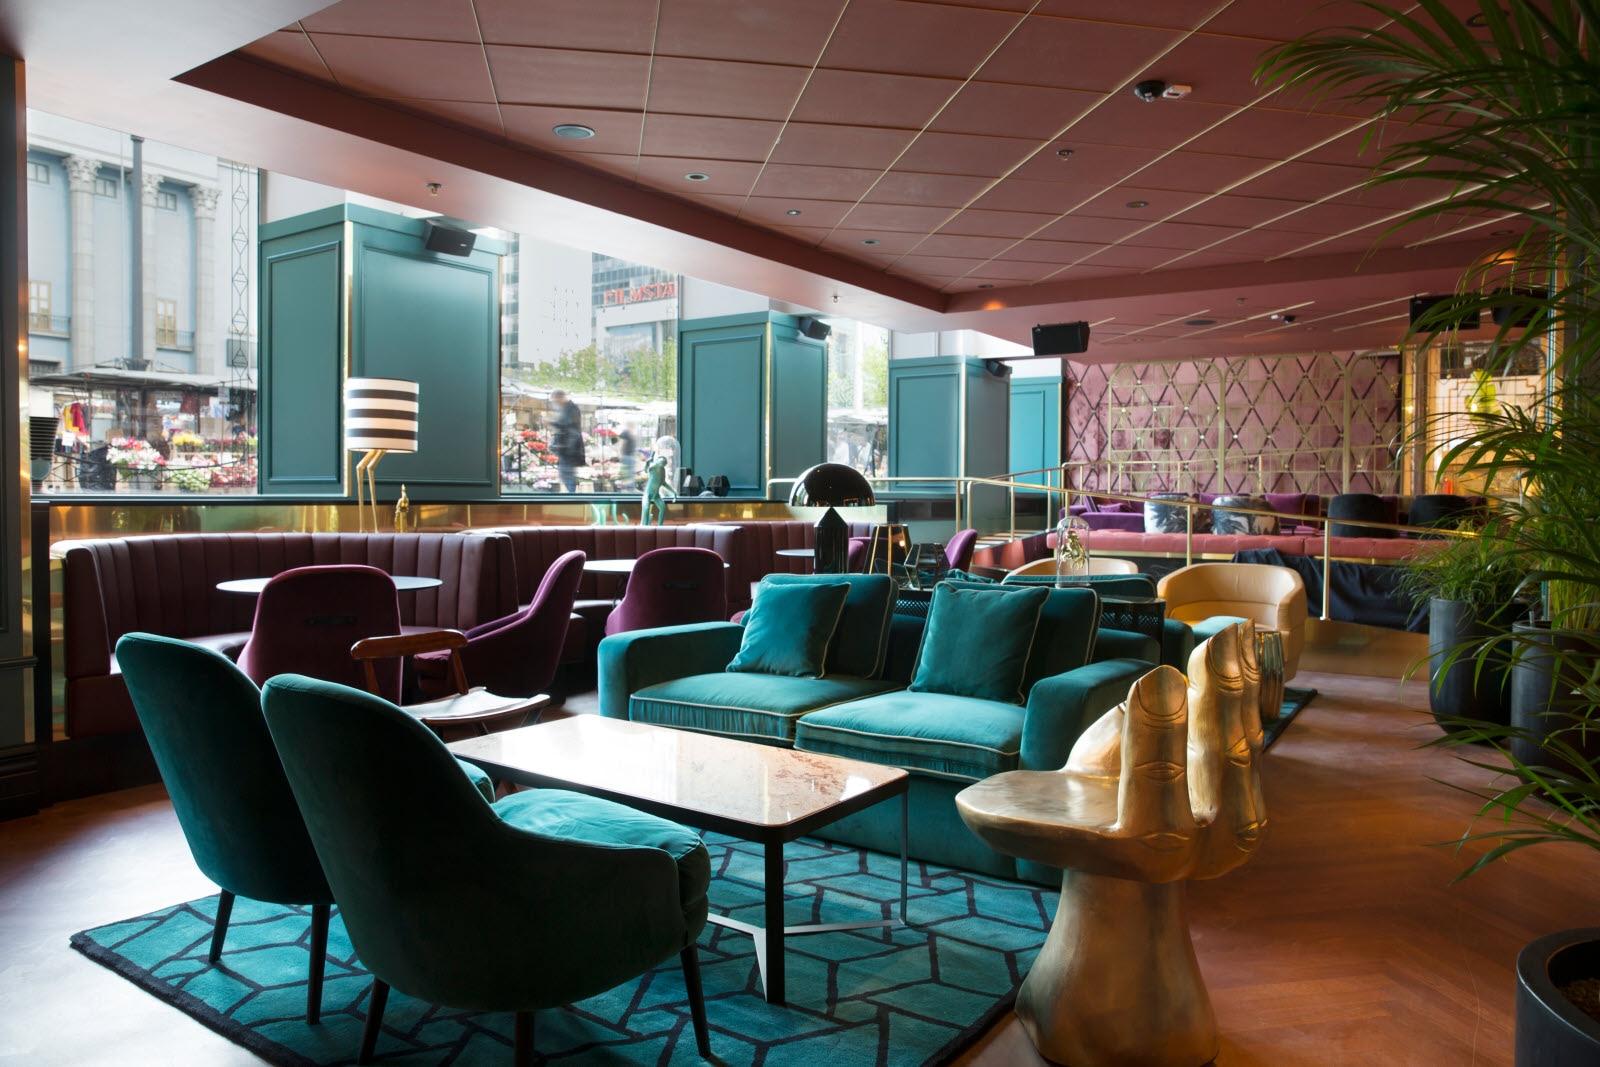 Haymarket by scandic scandic hotels for Scandic design